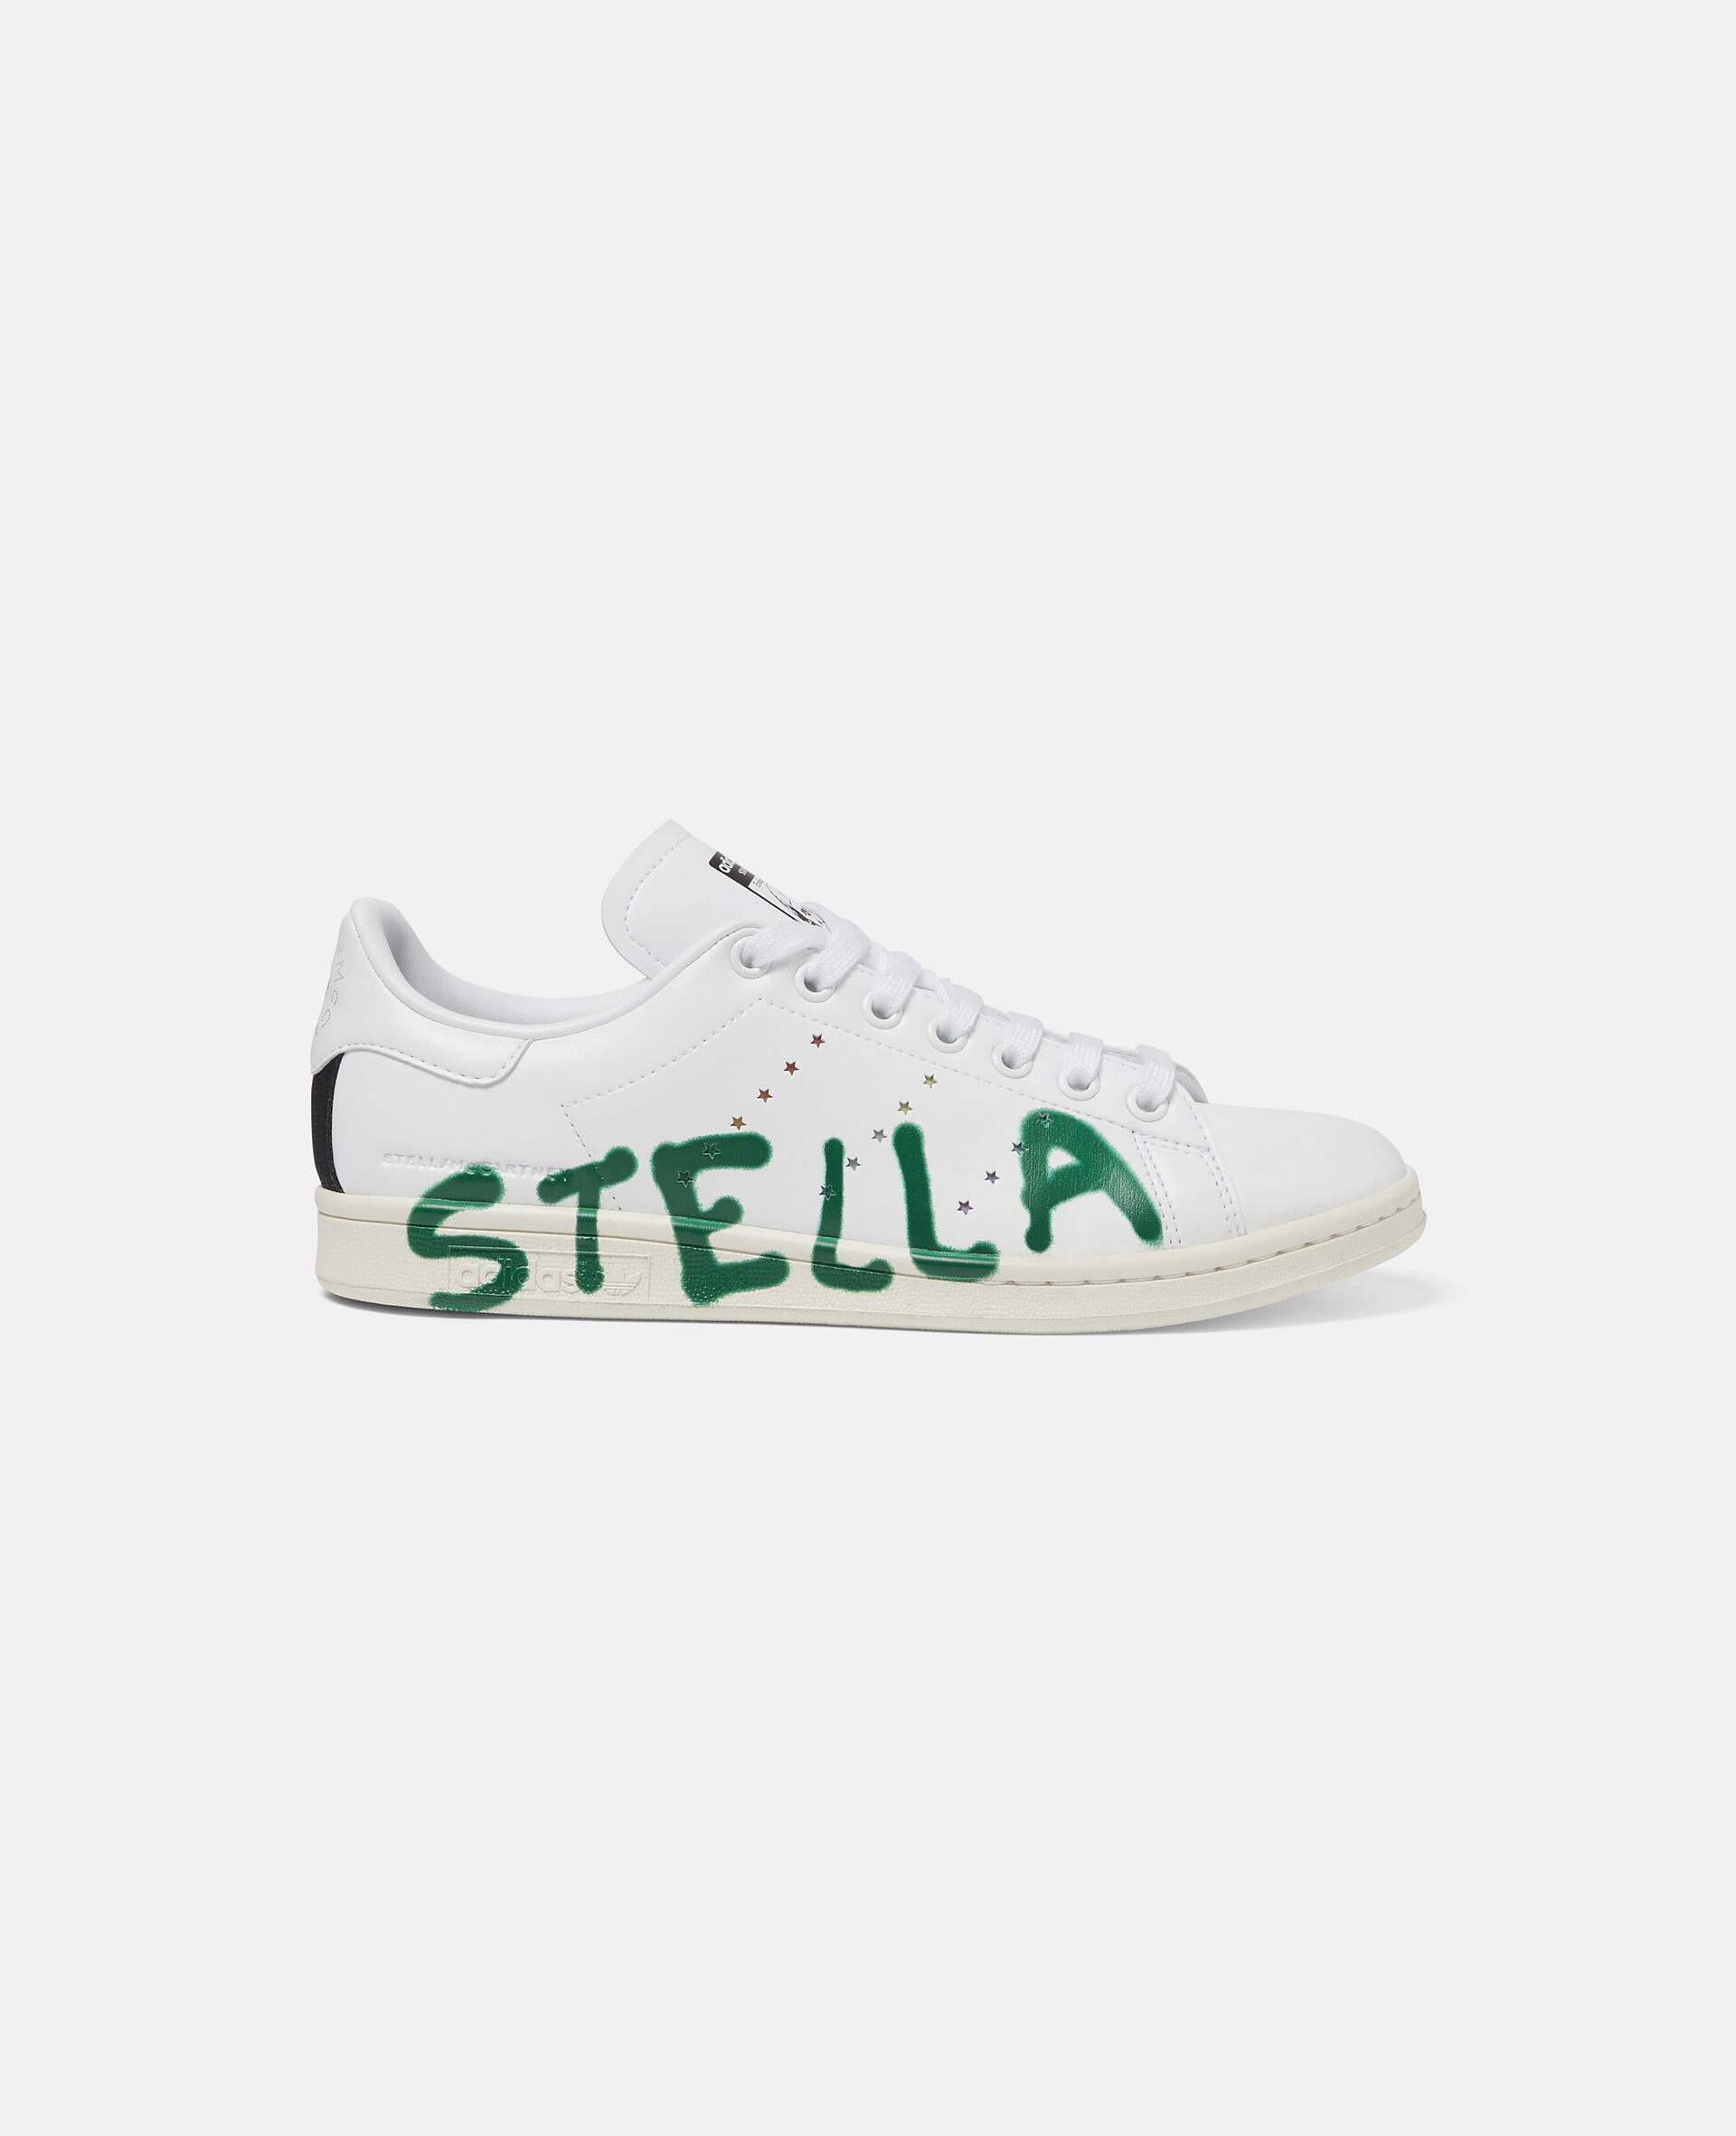 Ed Curtis Stella StanSmith adidas-Weiß-large image number 0